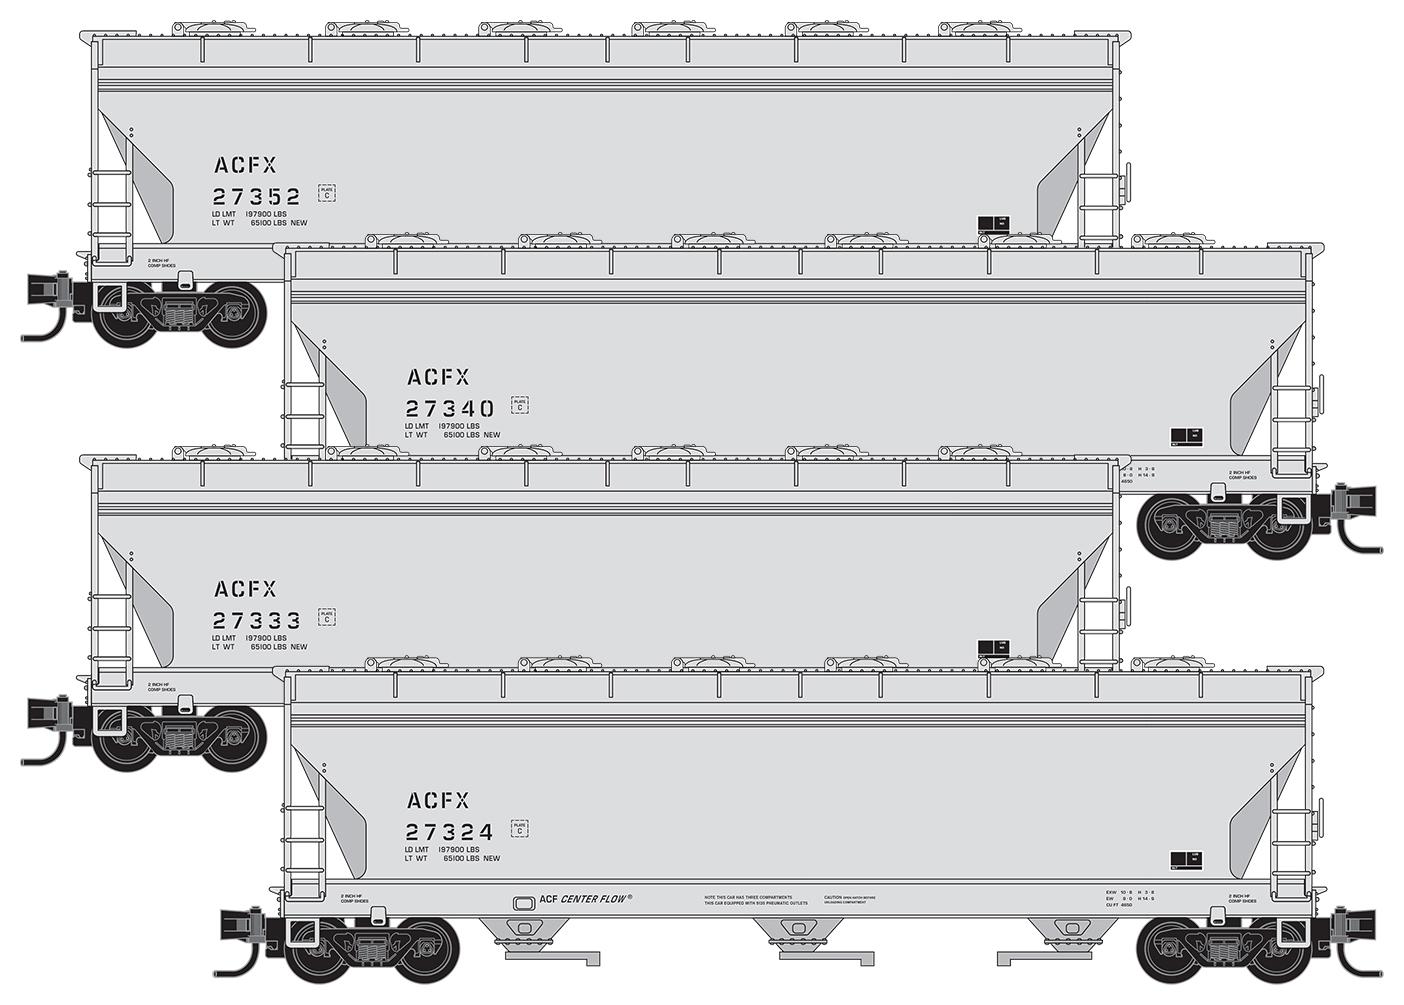 N Scale - Micro-Trains - 993 00 165 - Covered Hopper, 3-Bay, ACF 4650 - American Car & Foundry - 4-Pack